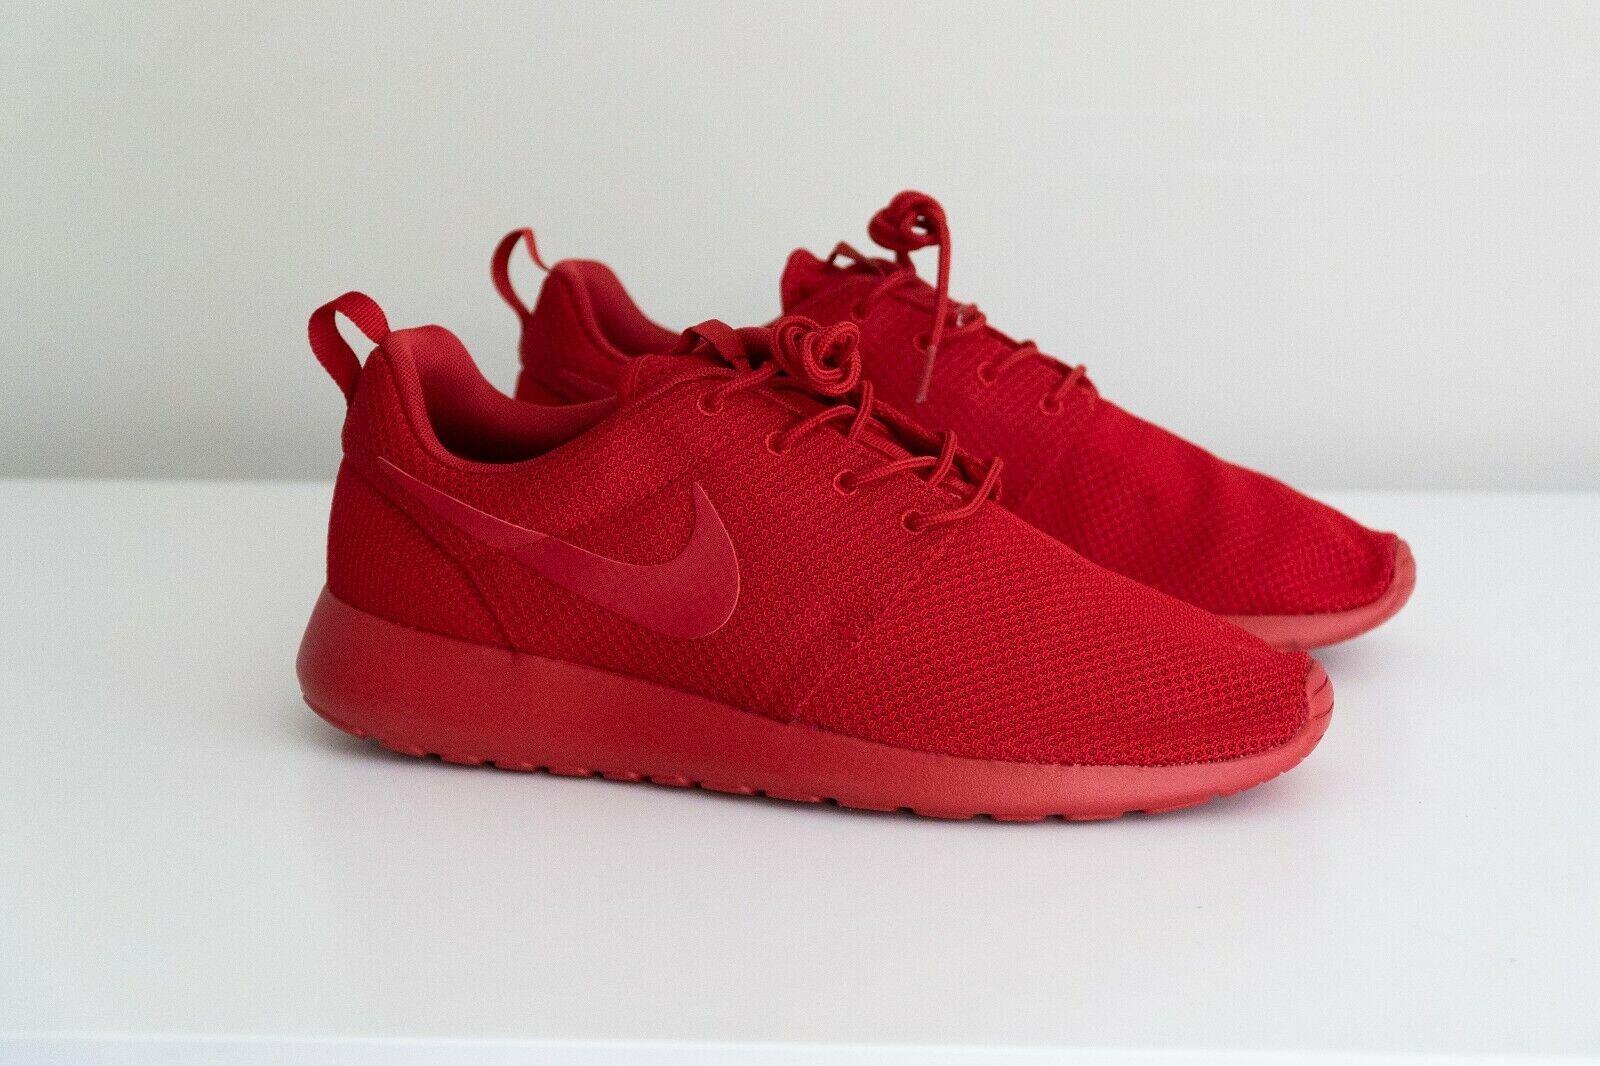 promo code 57731 4bc93 Men's Nike Roshe One Shoes Varsity Red October 511881-666 Size 11